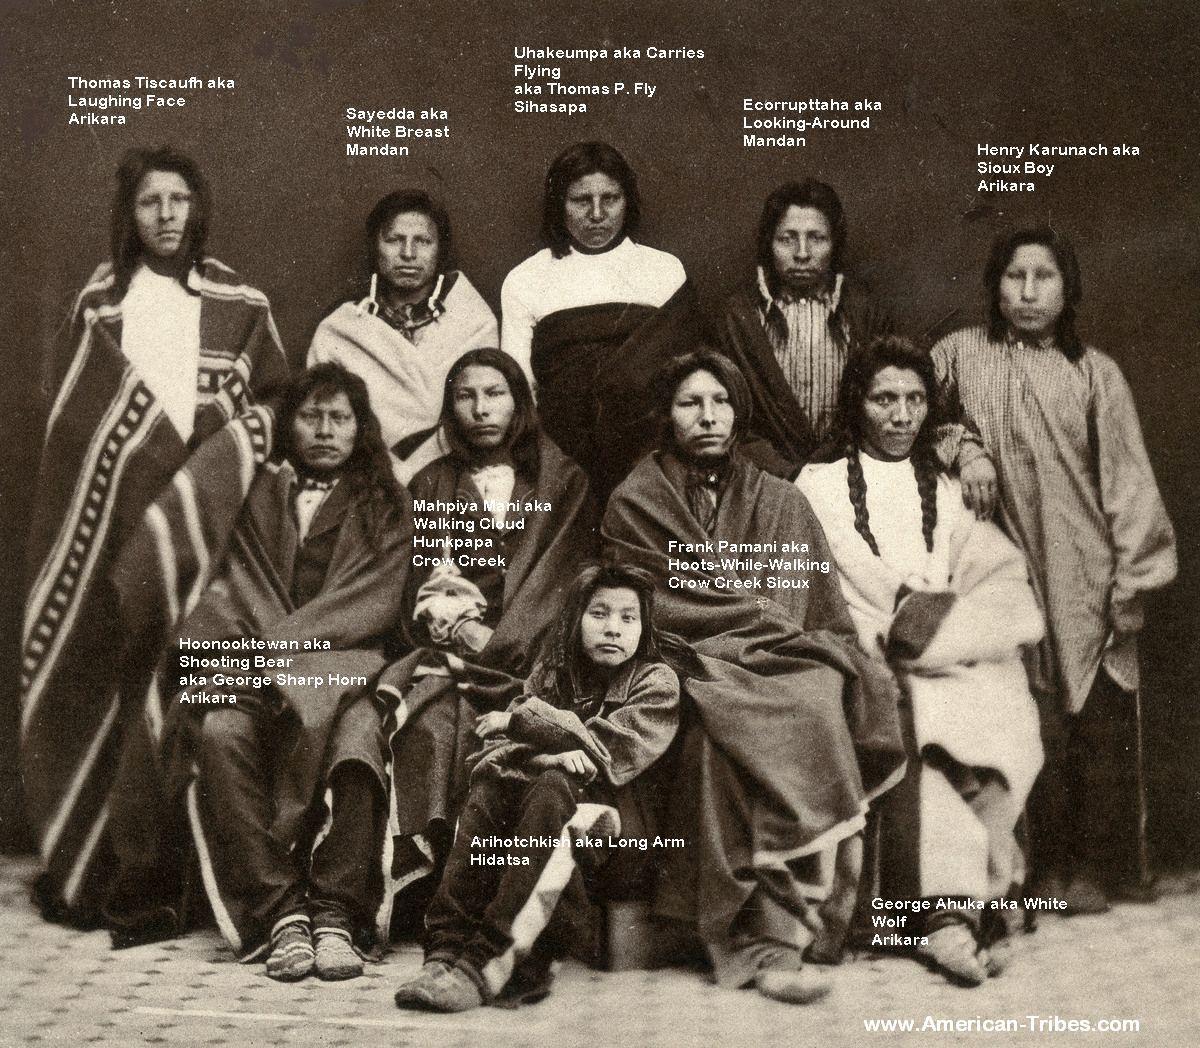 http://www.american-tribes.com/messageboards/dietmar/hamptonID2.jpg